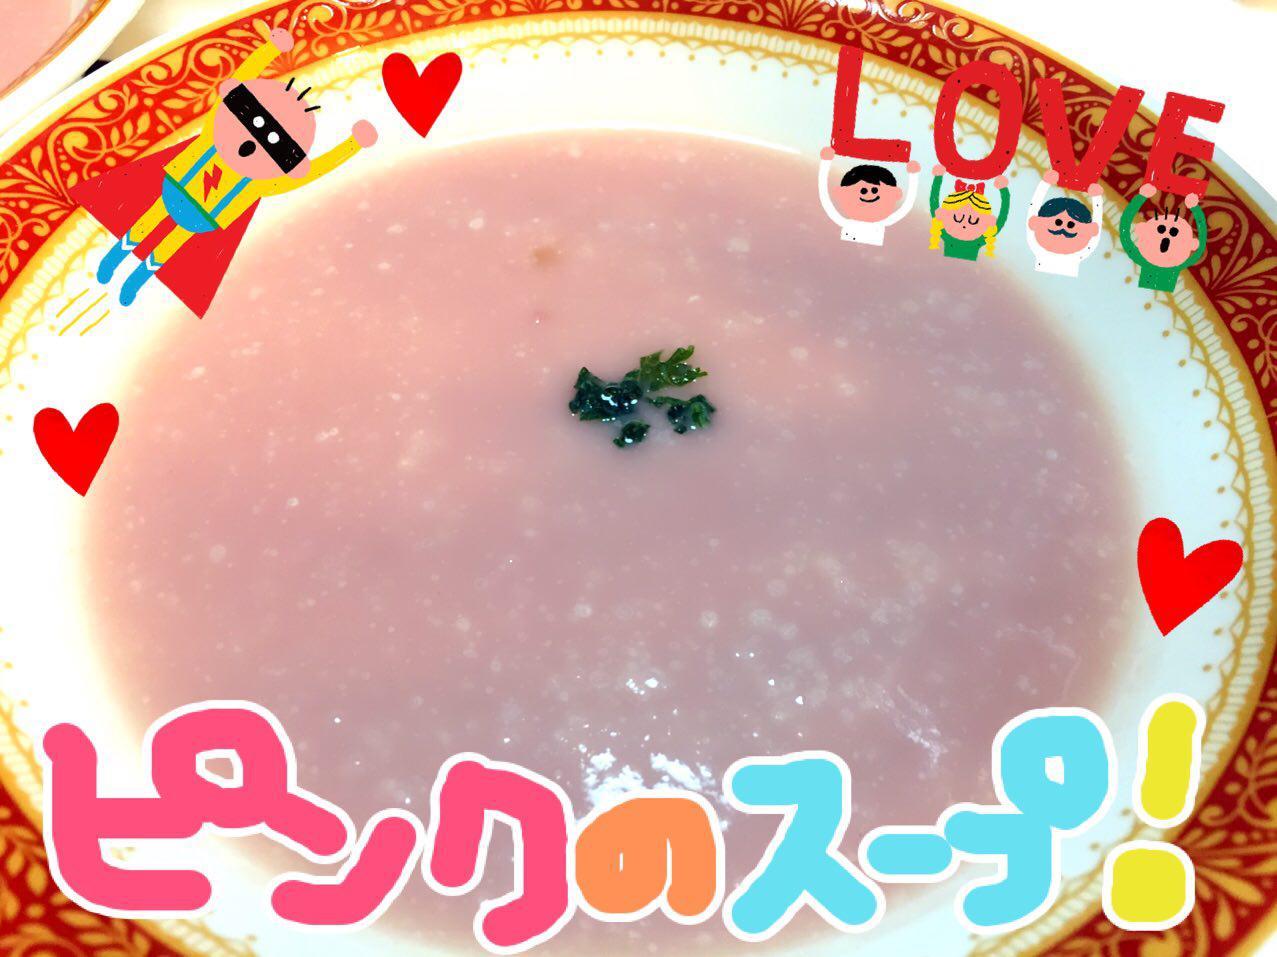 photo_2017-01-25_00-12-30.jpg